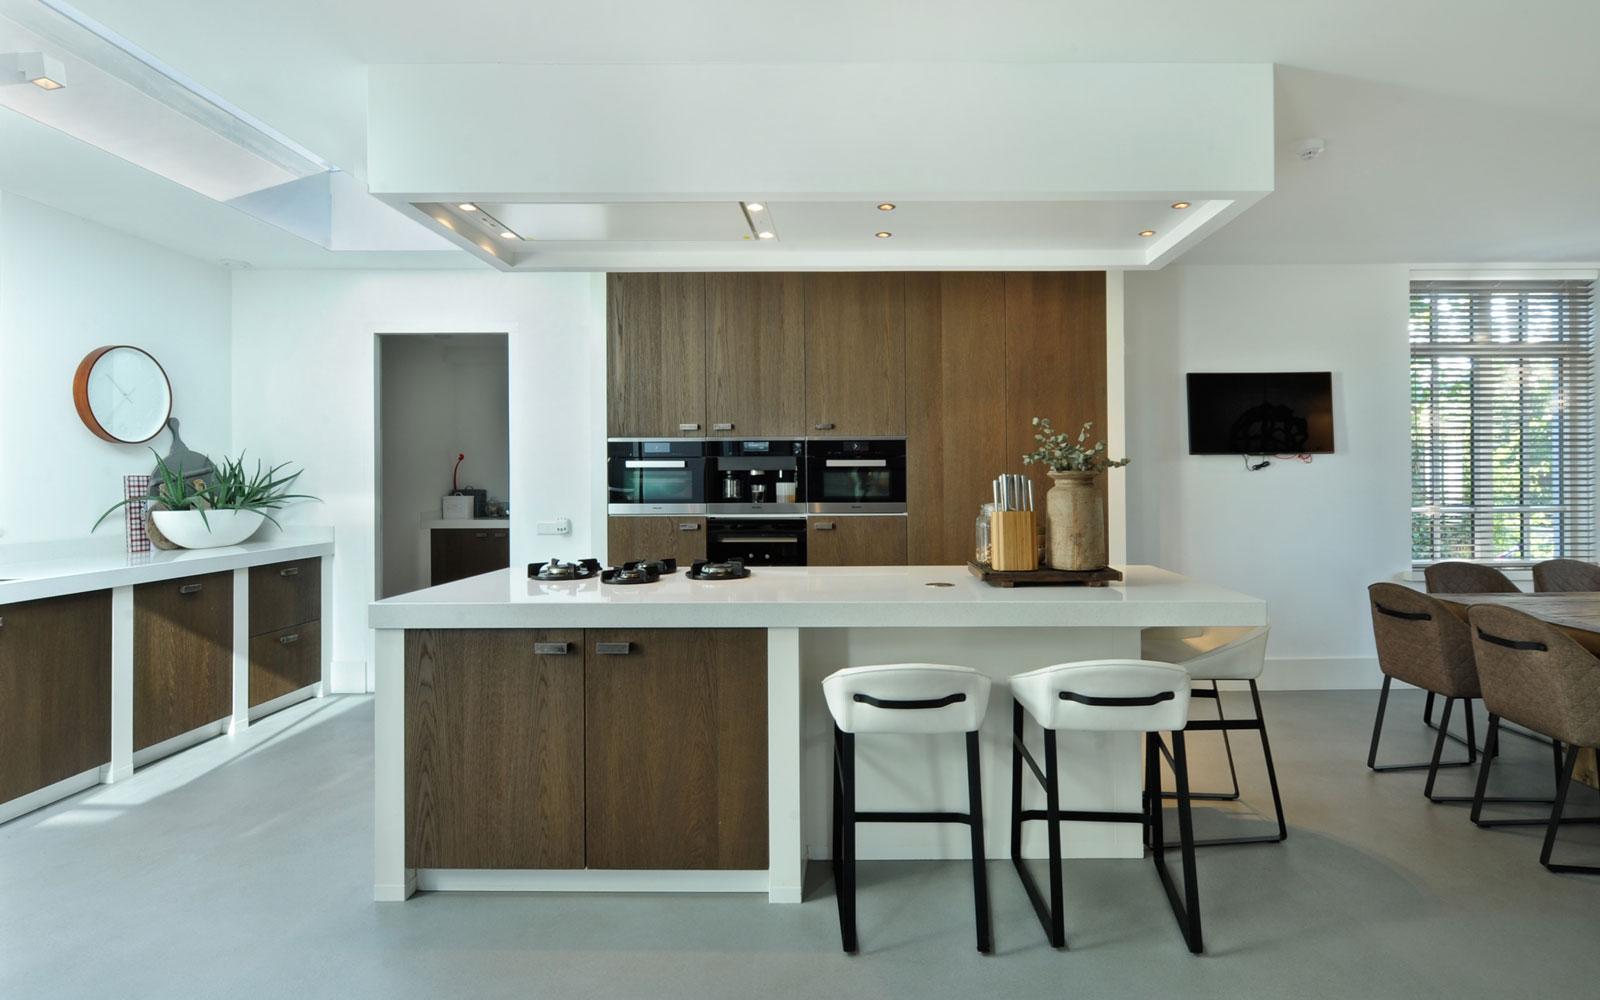 Keuken, wit, hout, ruimtelijk, licht, metamorfose, Boxxis Architecten